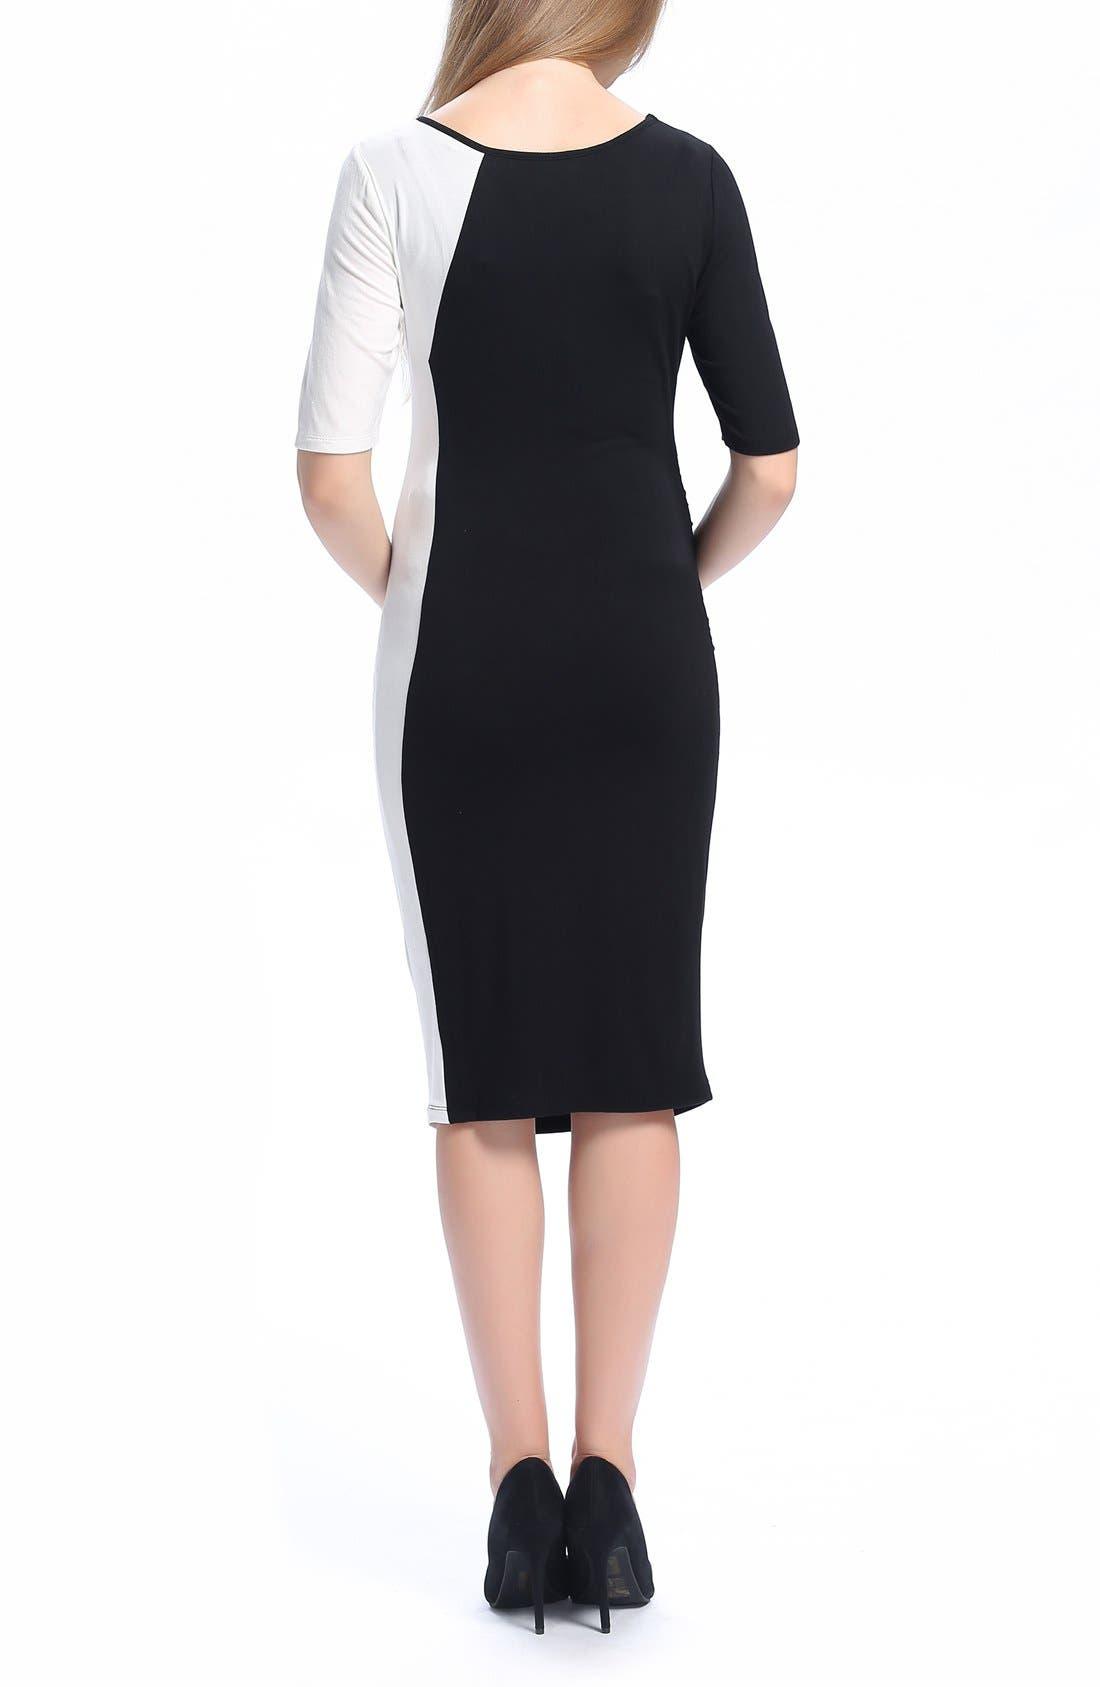 Daphne Colorblock Maternity Dress,                             Alternate thumbnail 2, color,                             Black/ White